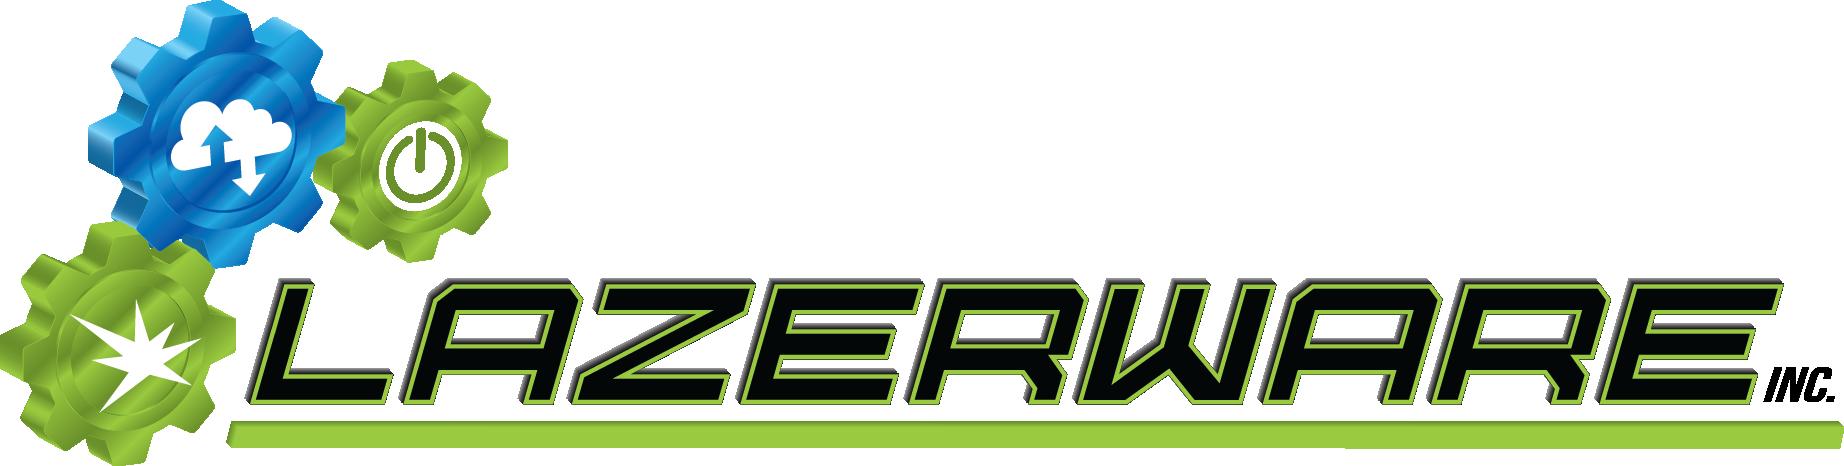 Lazerware Inc.